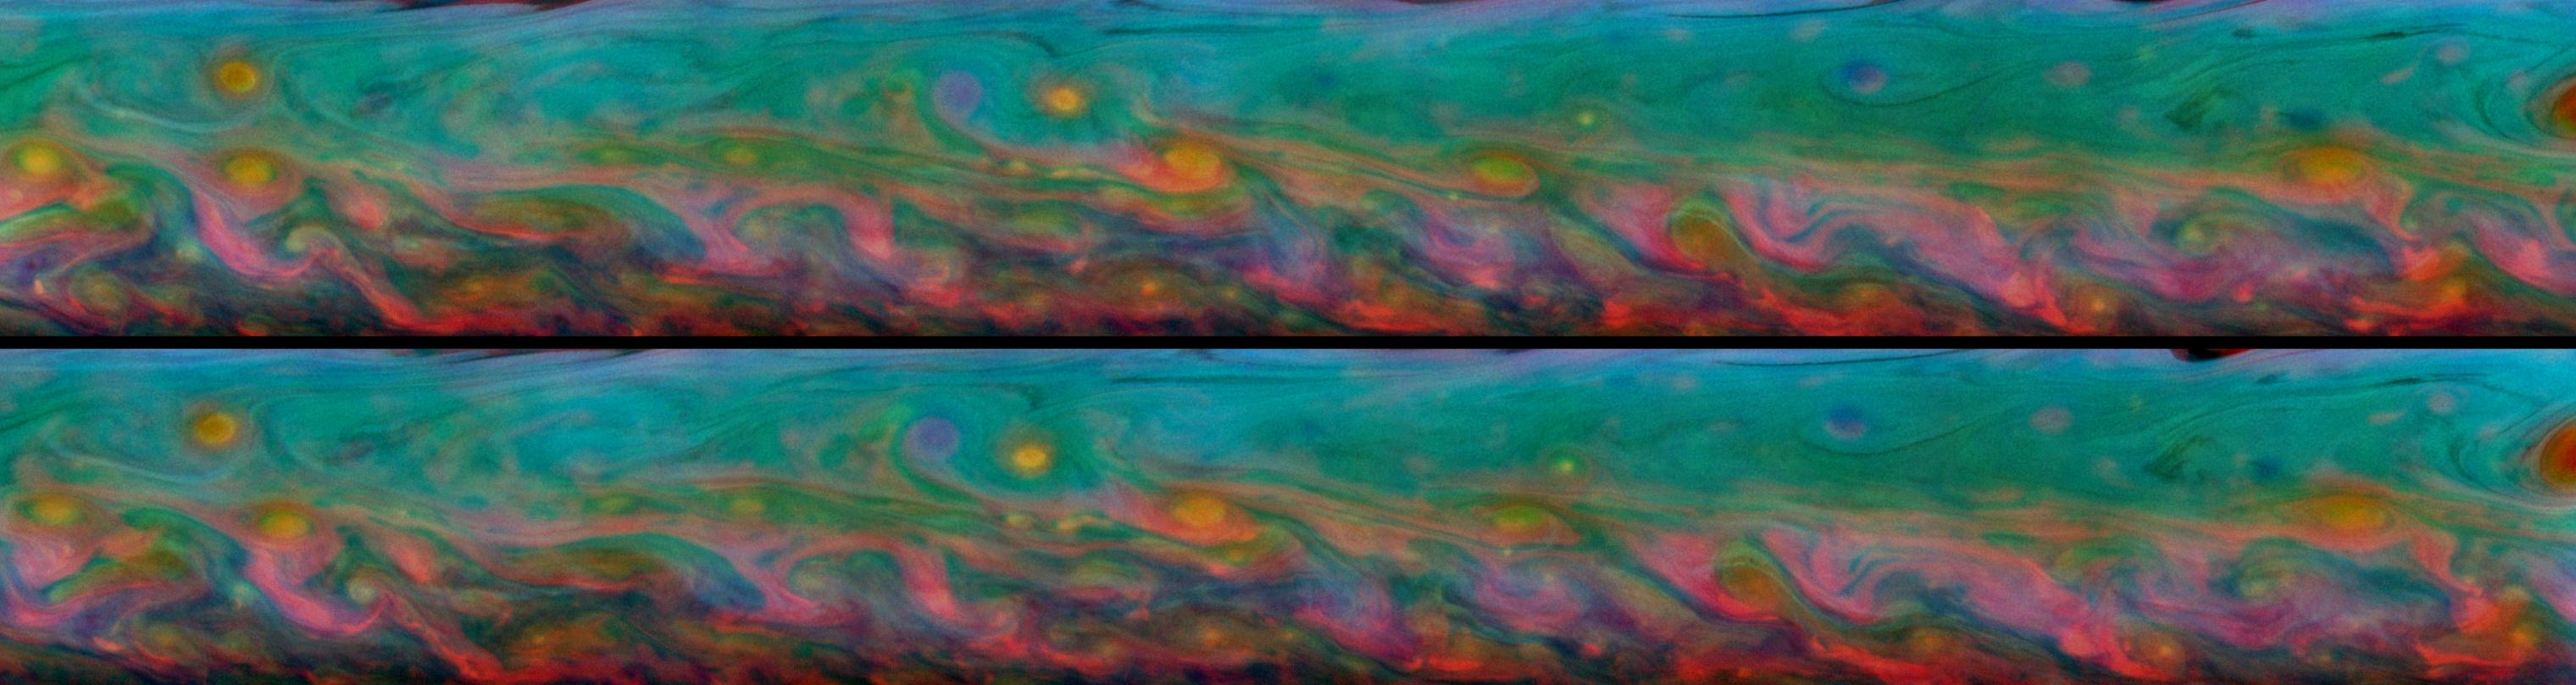 Saturn's Rainbow Storm